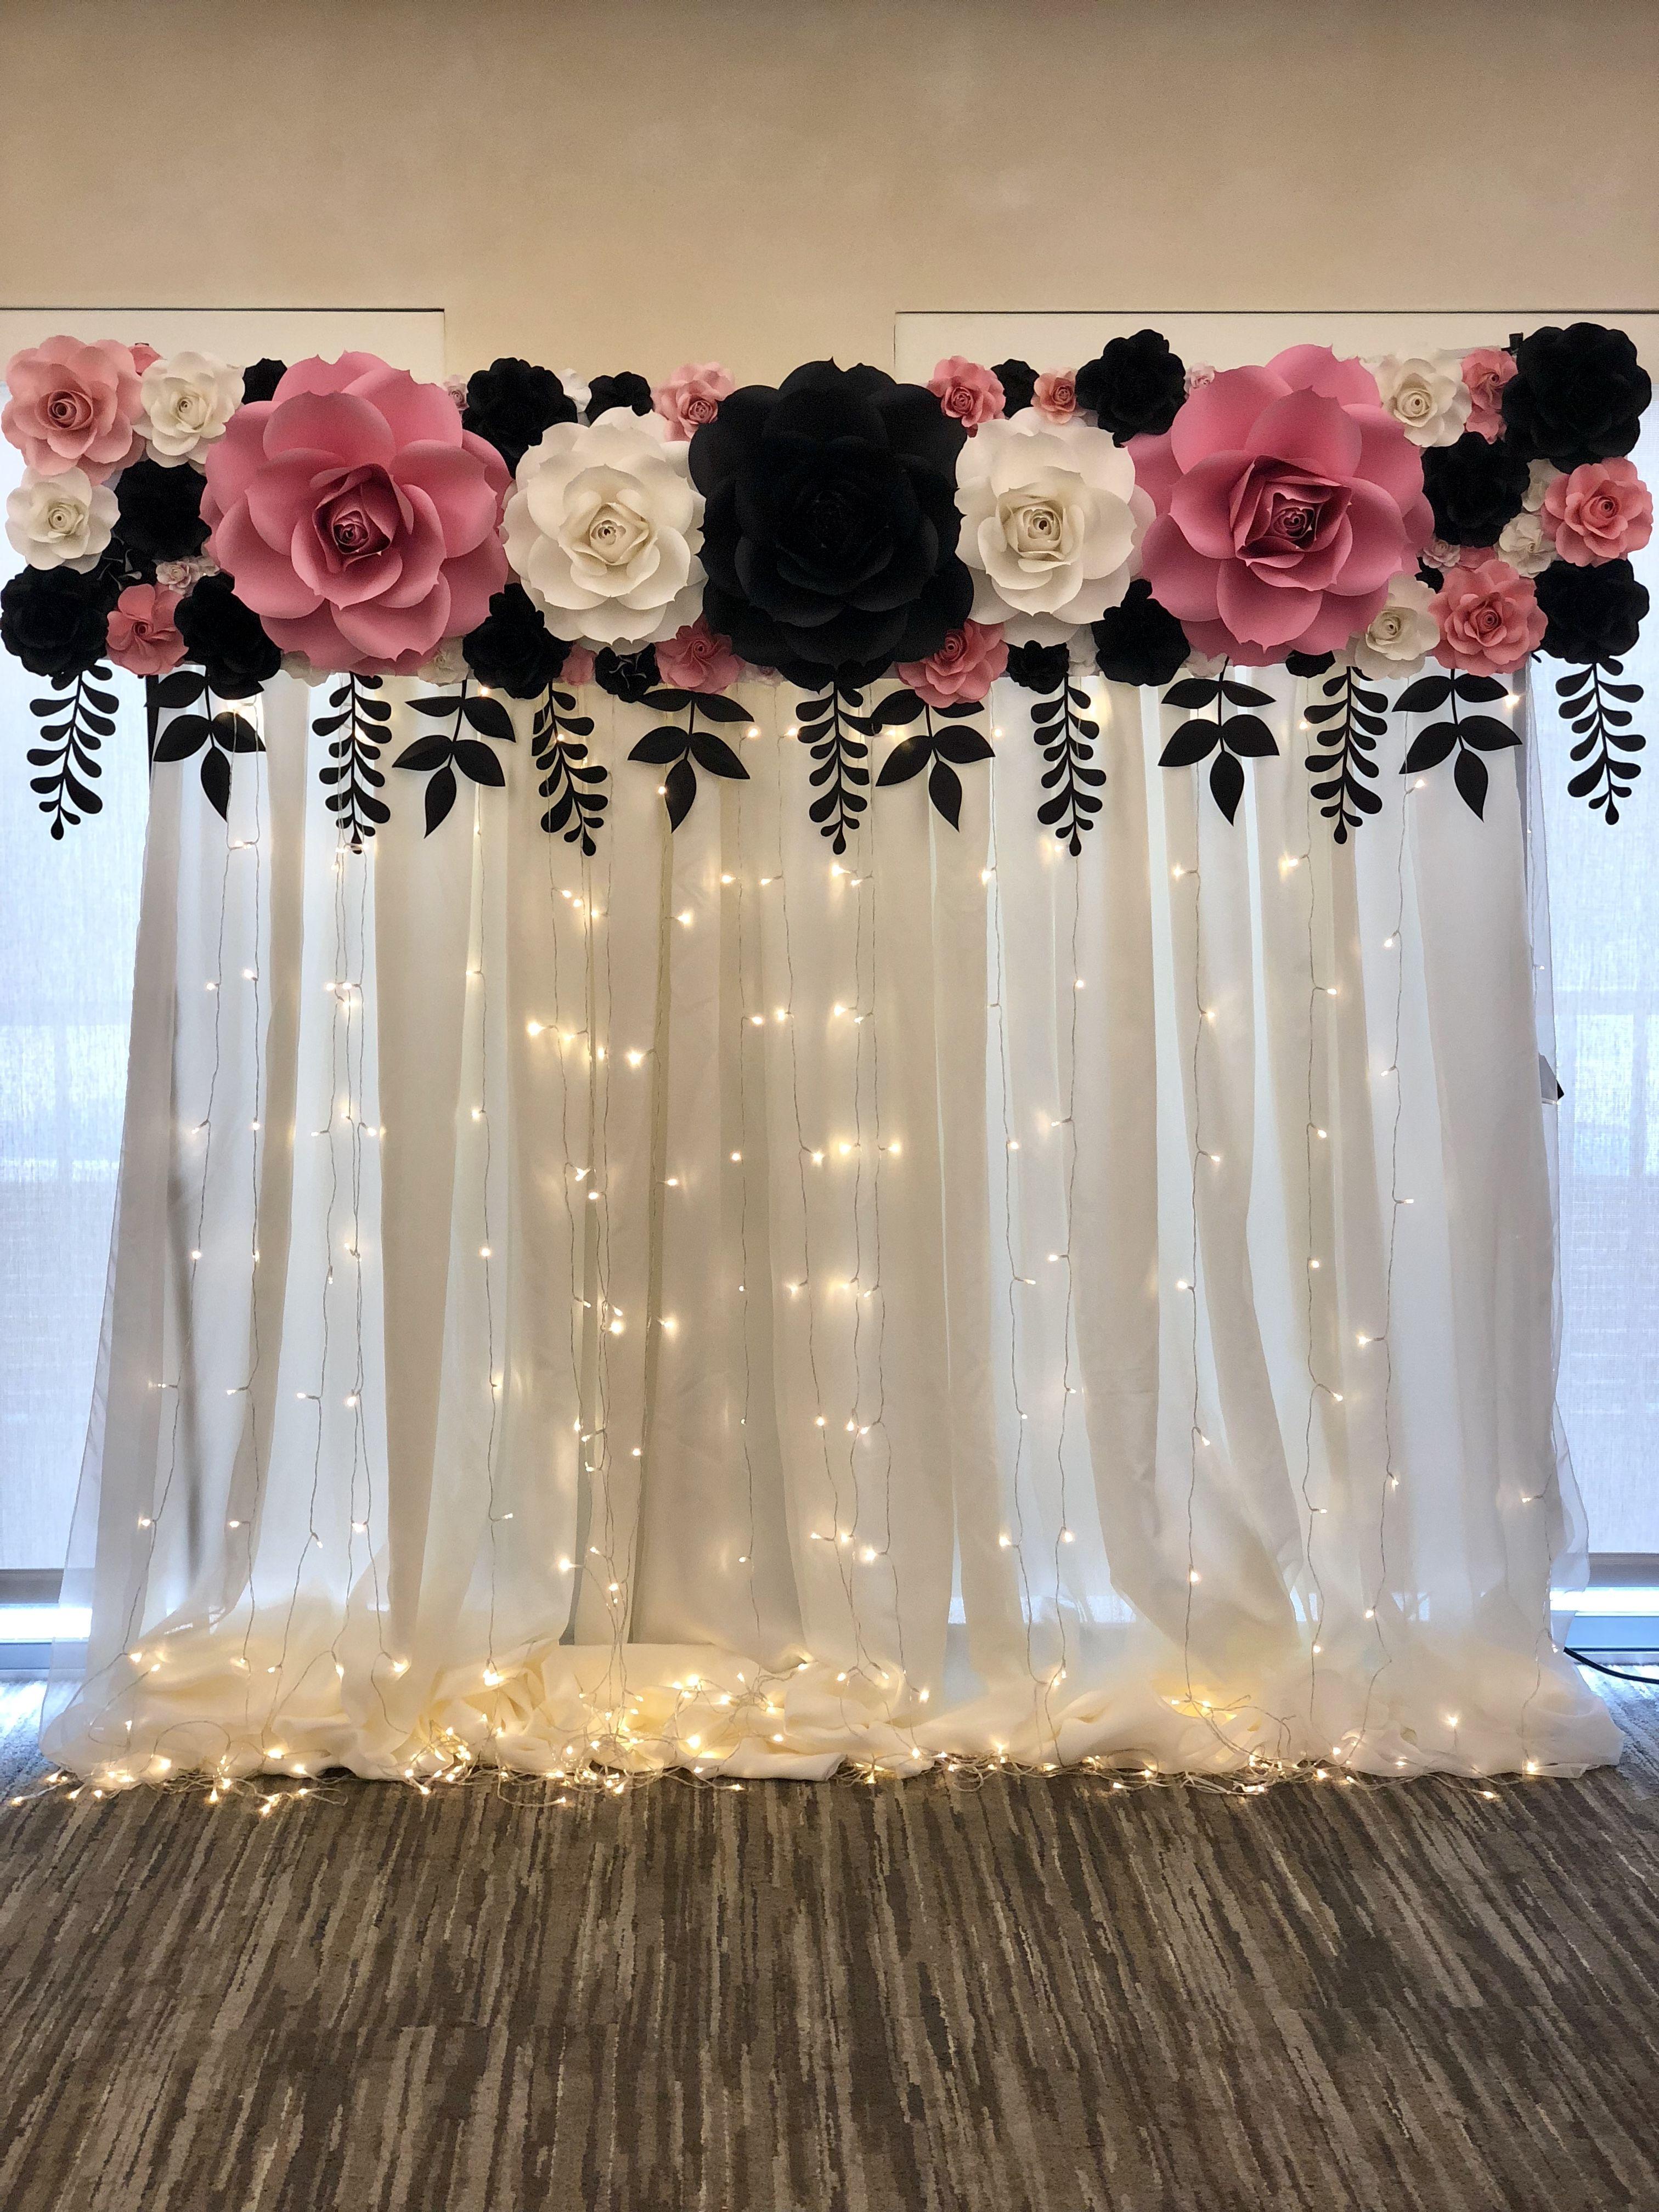 Paper Flower Backdrop Fiesta De 15 Decoracion Decoracion De